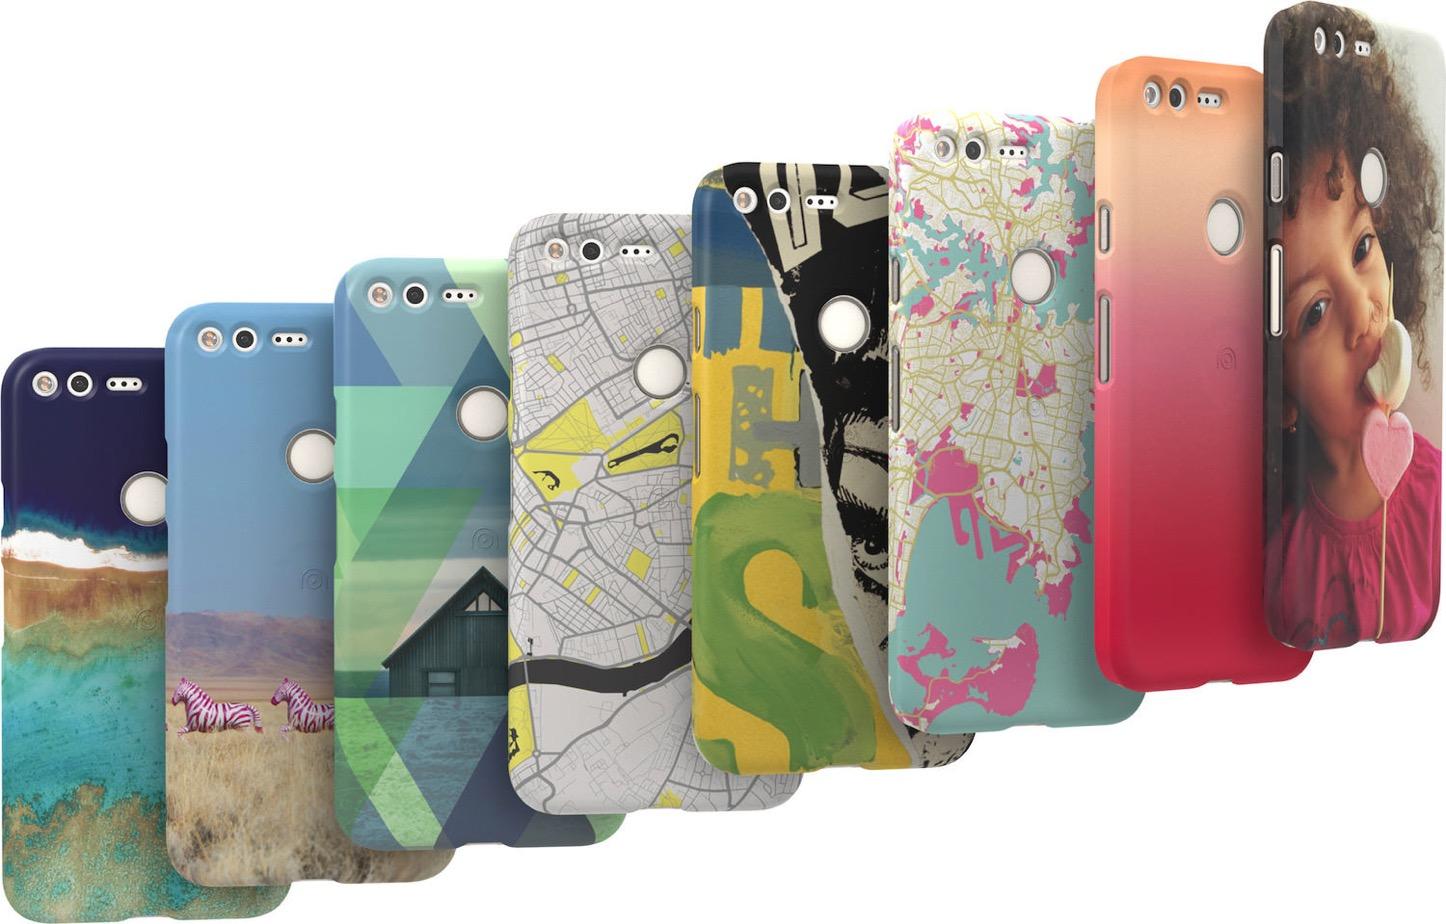 Phone accessories module accessories image 1440 2x